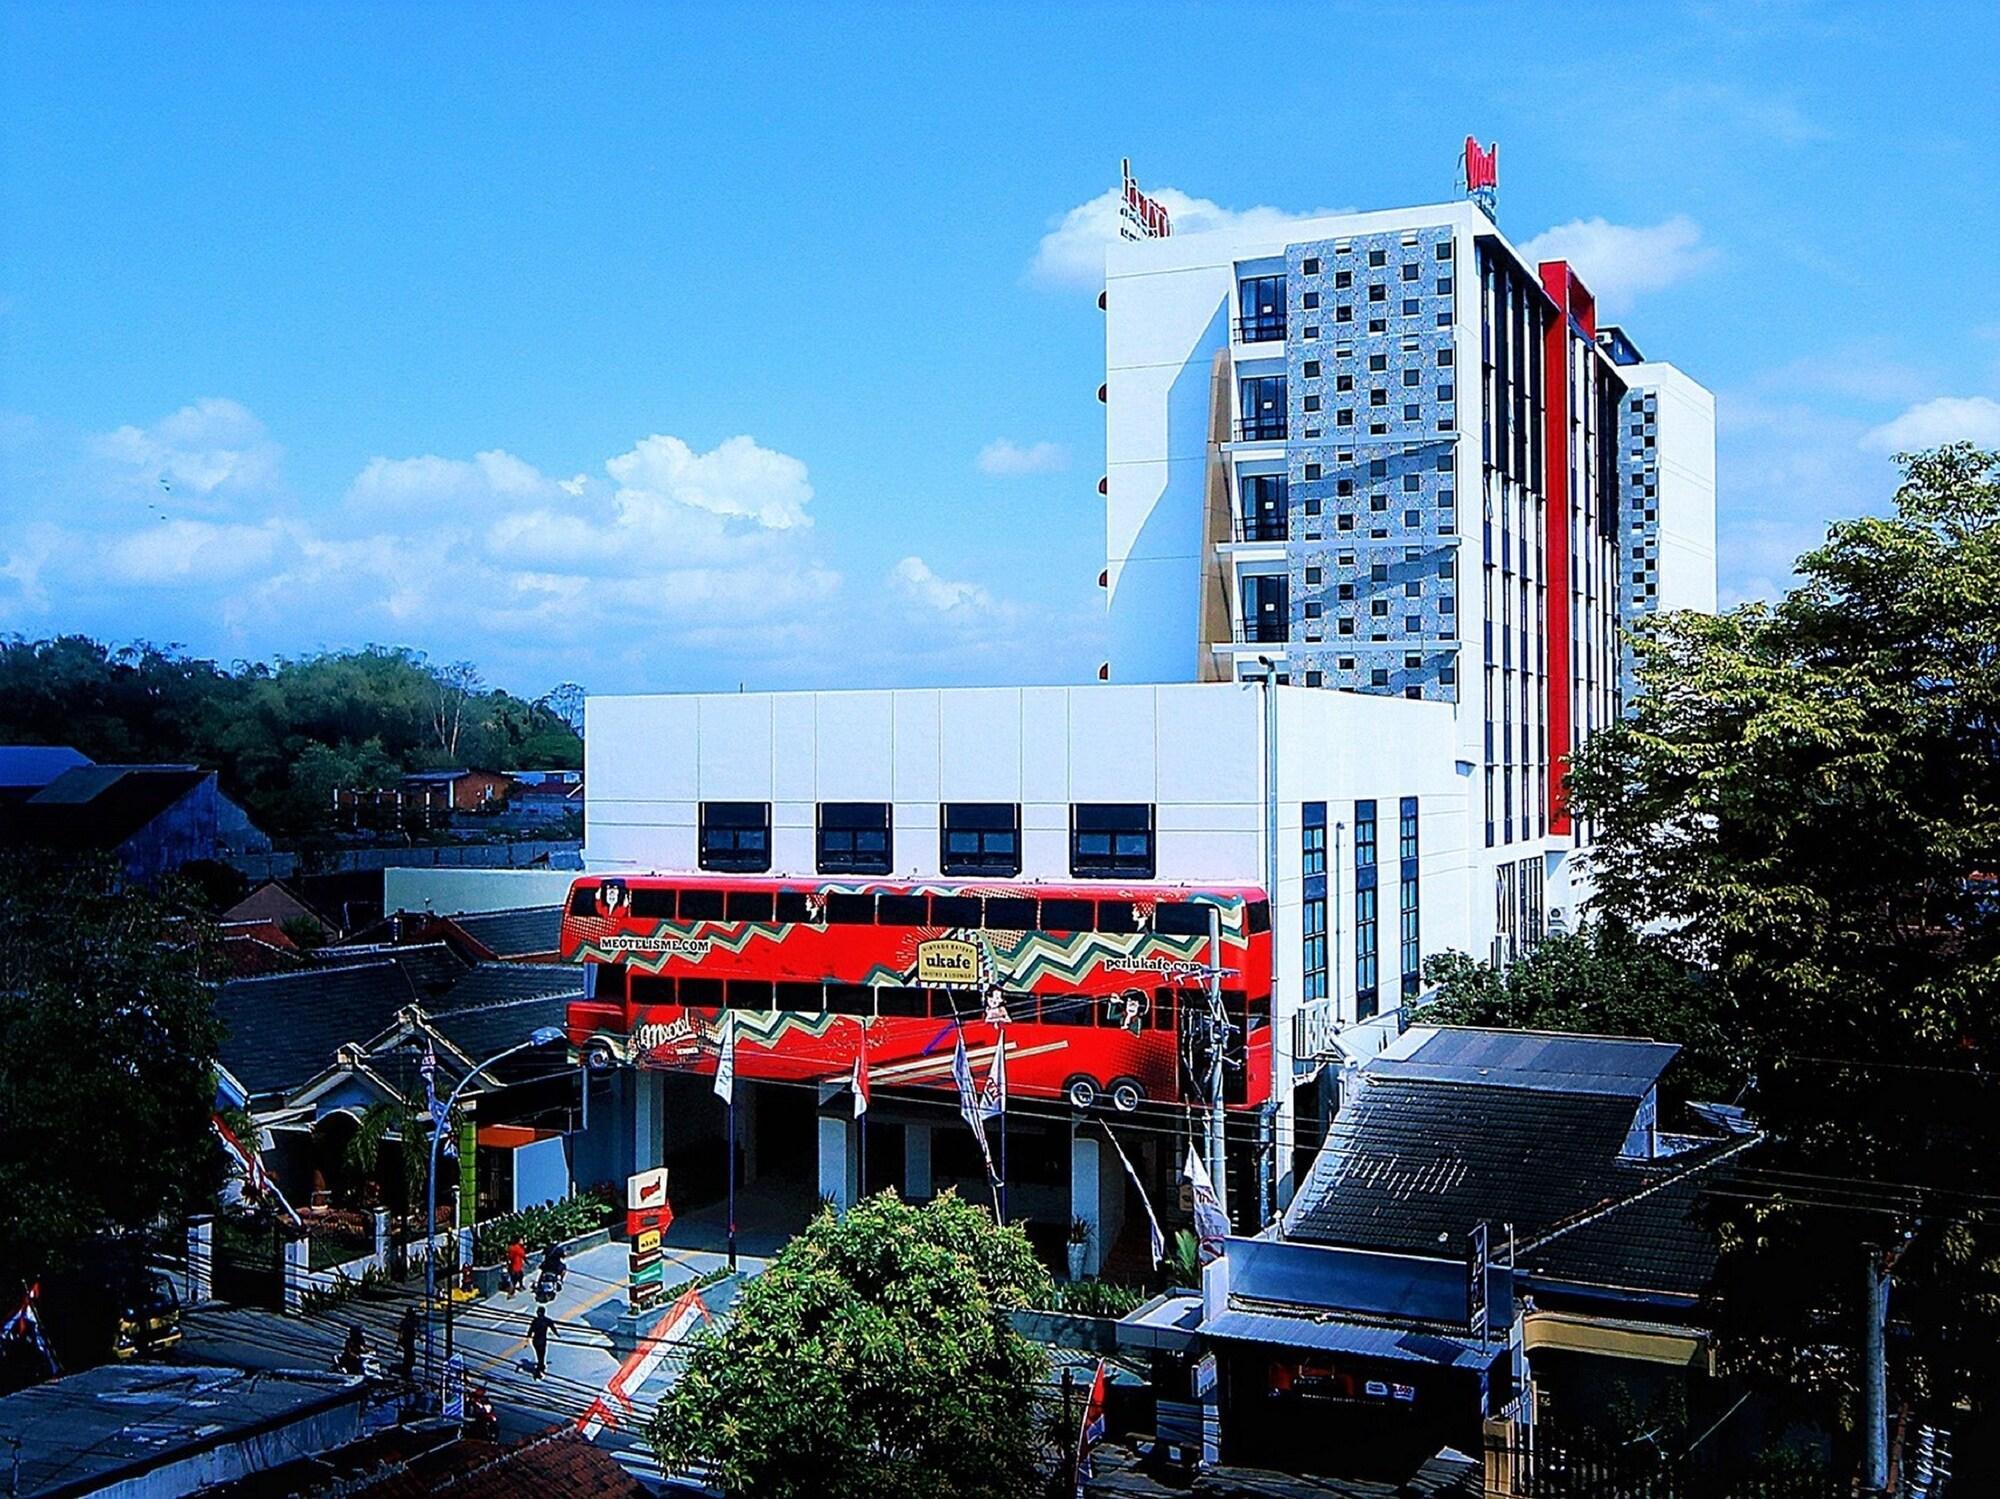 Hotel Royal Jember : hotel, royal, jember, Royal, Hotel, Lounge,, Jember,, Indonesia, Bandingkan, Promo